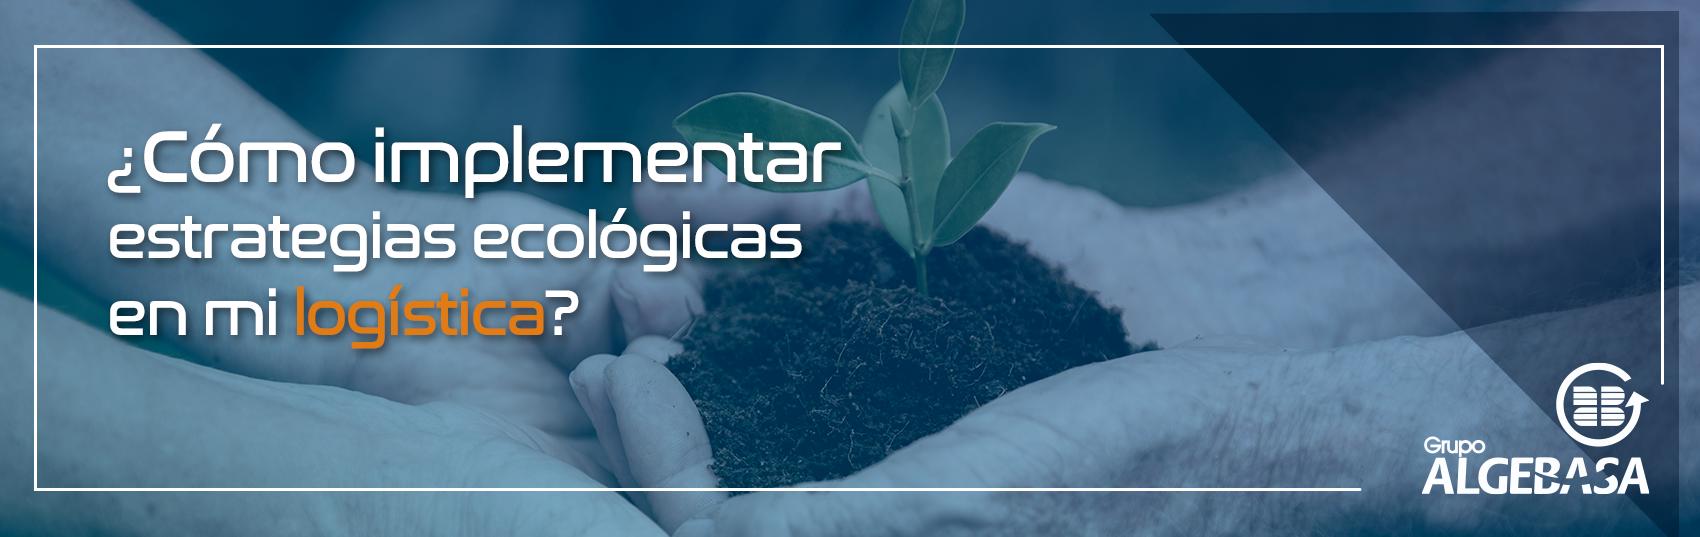 Como-implementar-estrategias-ecologicas-en-mi-logistica_banner